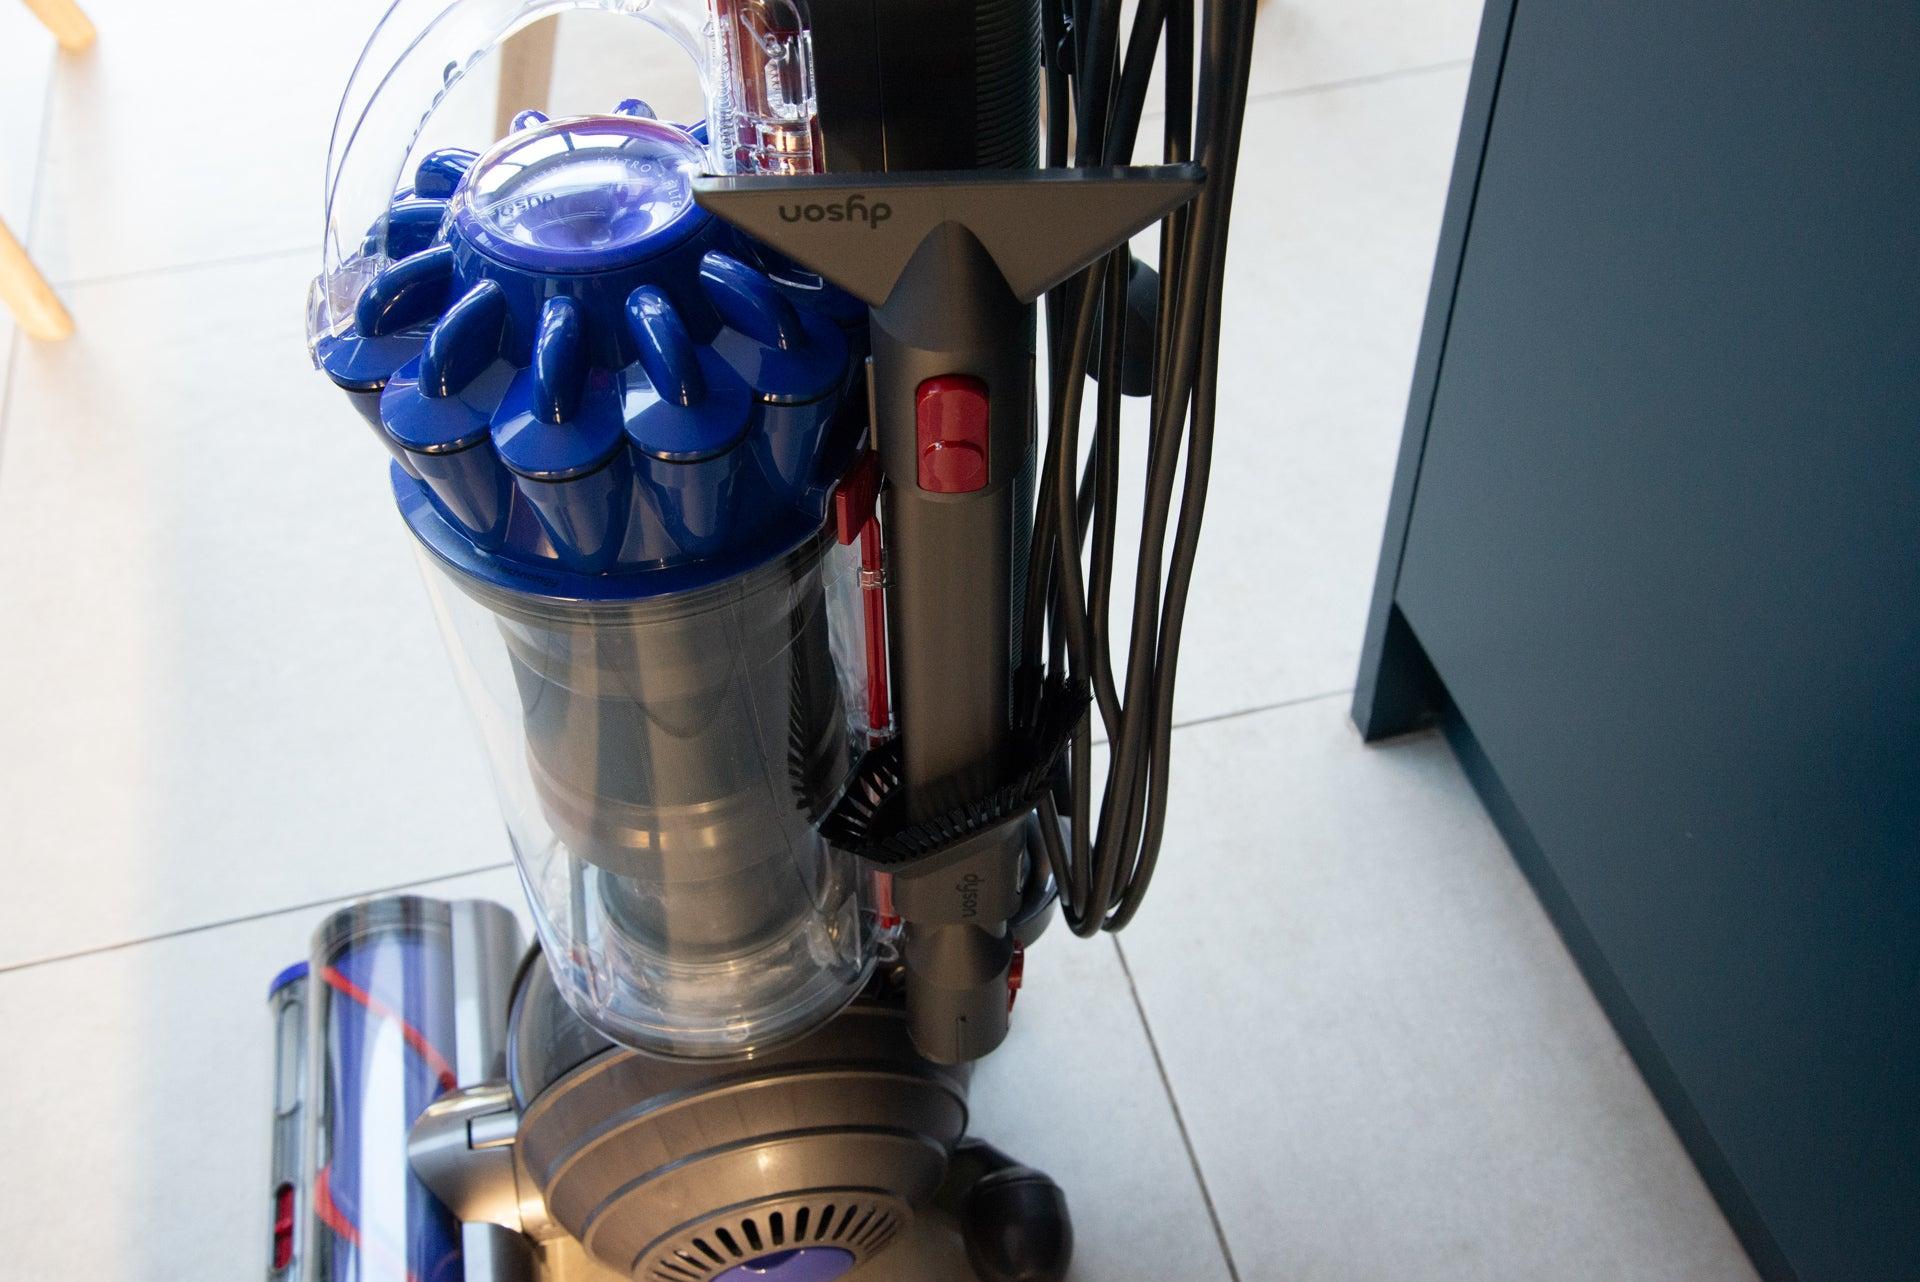 Dyson Small Ball Allergy accessory holder